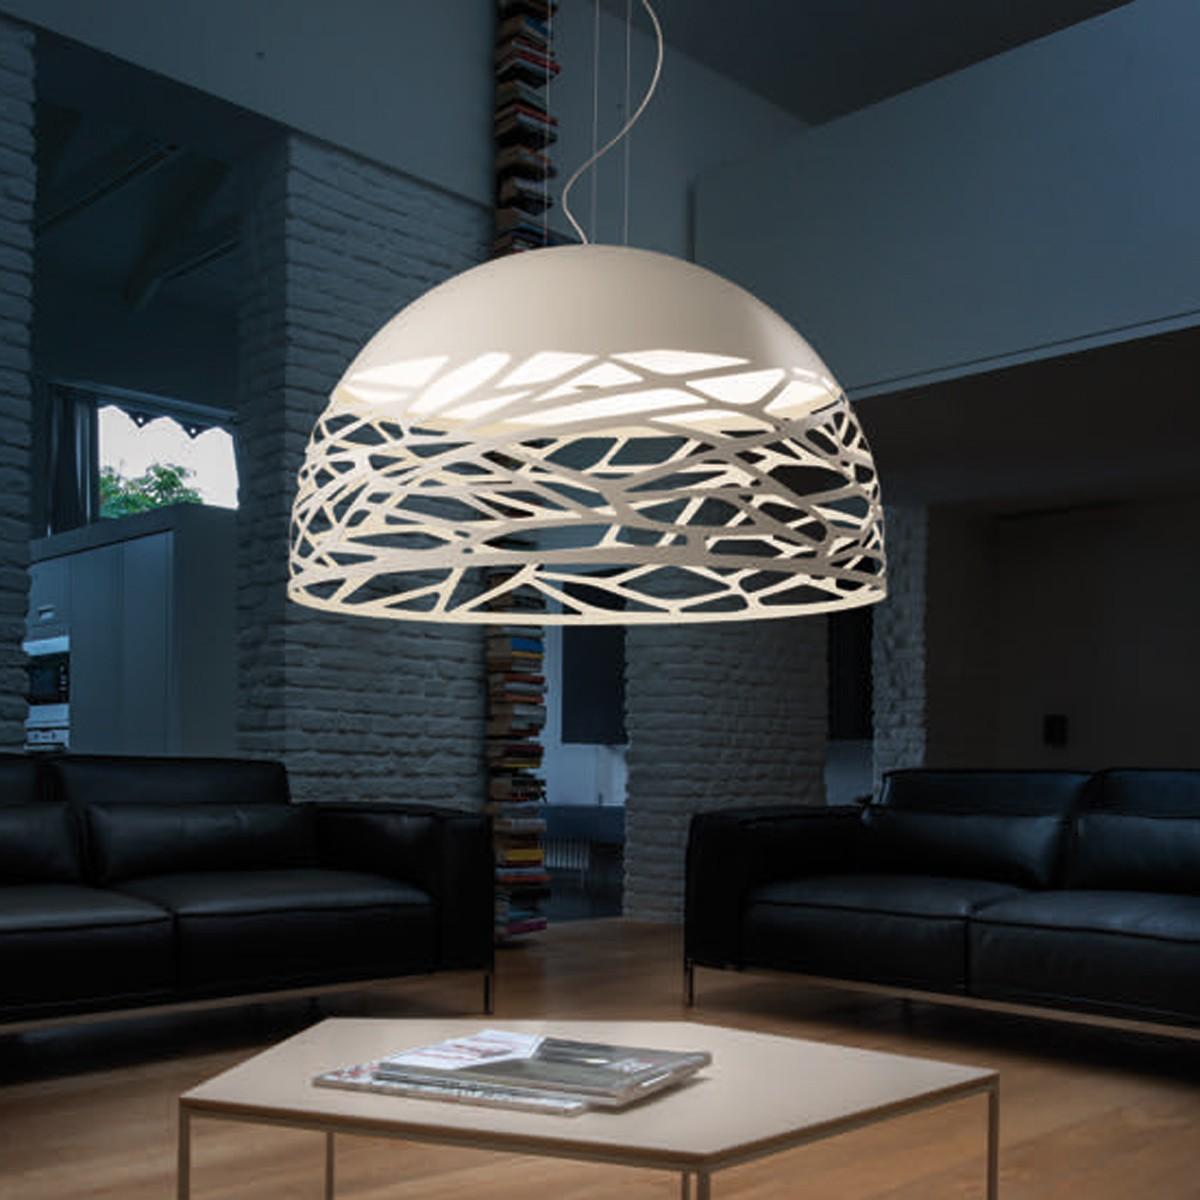 Studio Italia Design Kelly Large Dome 80 Pendelleuchte, weiß matt